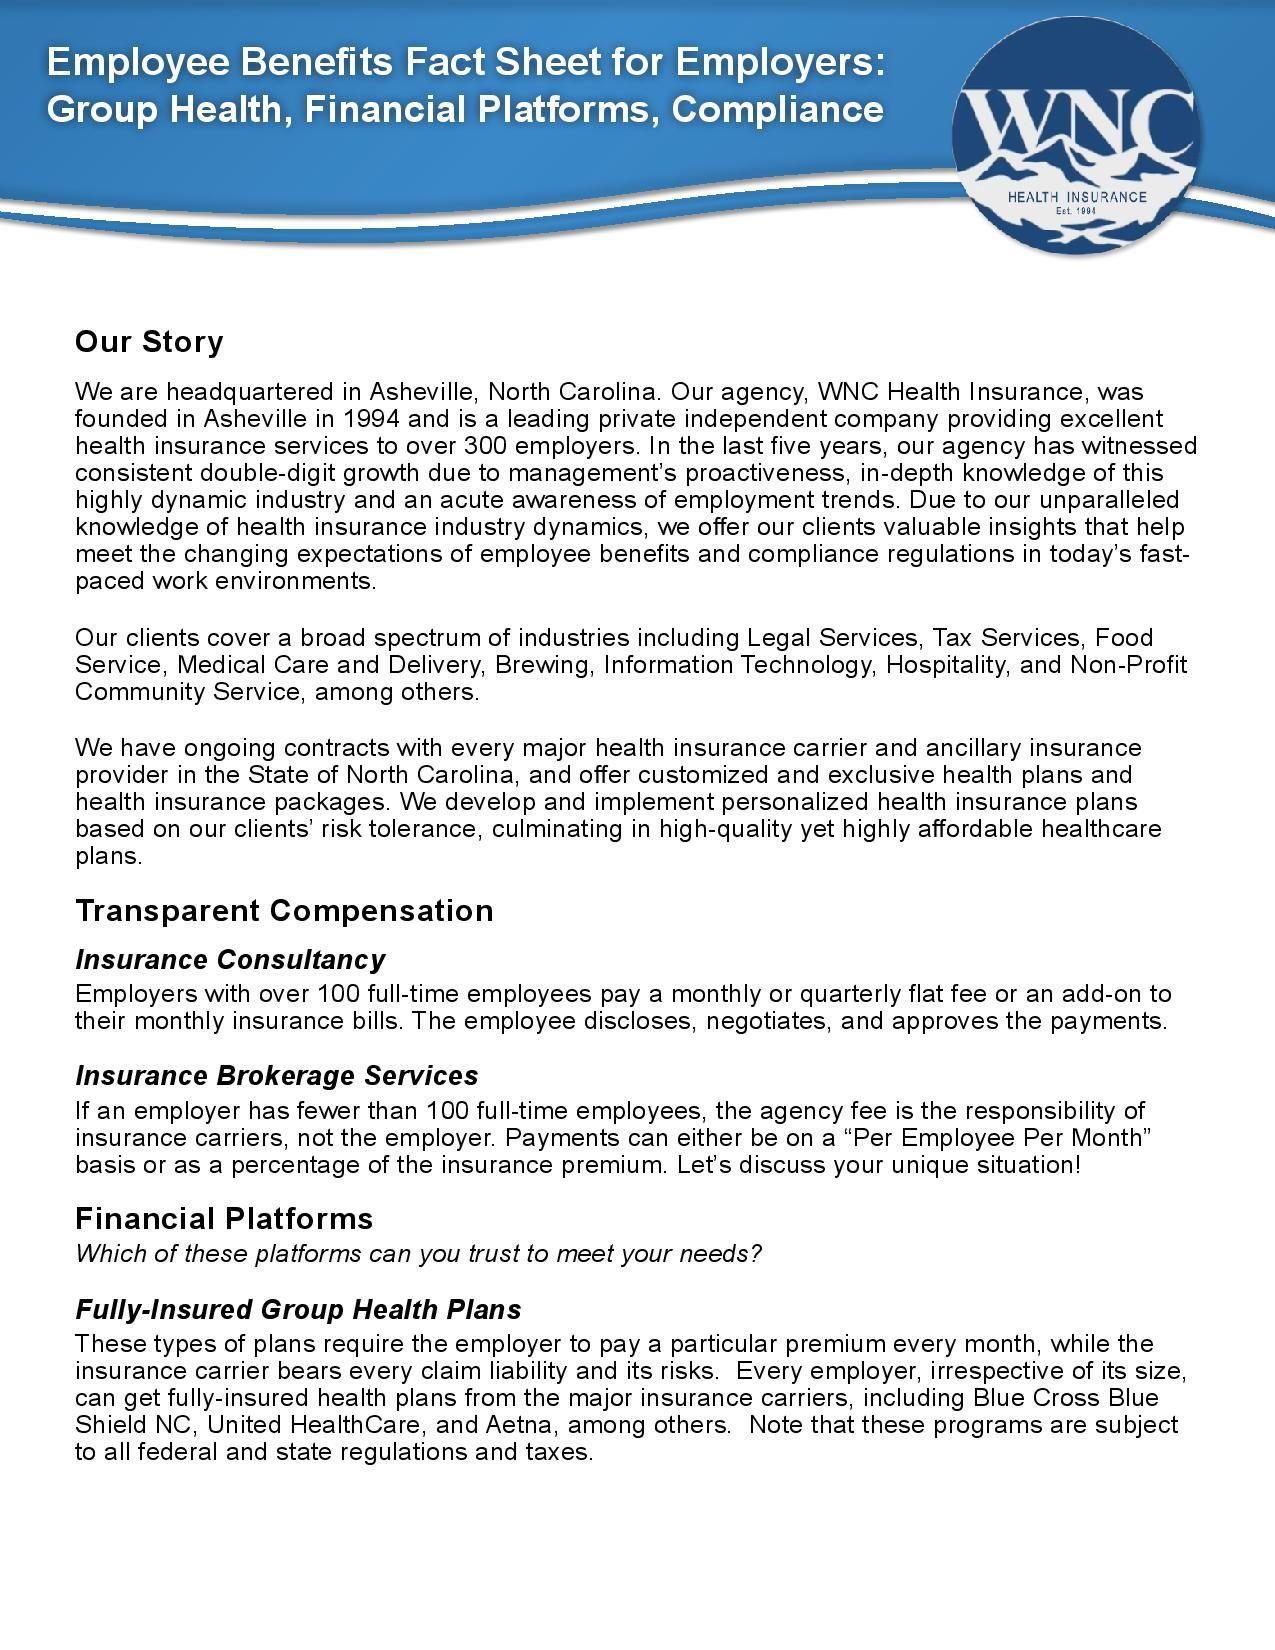 Health Insurance Employee Benefits Fact Sheet Health